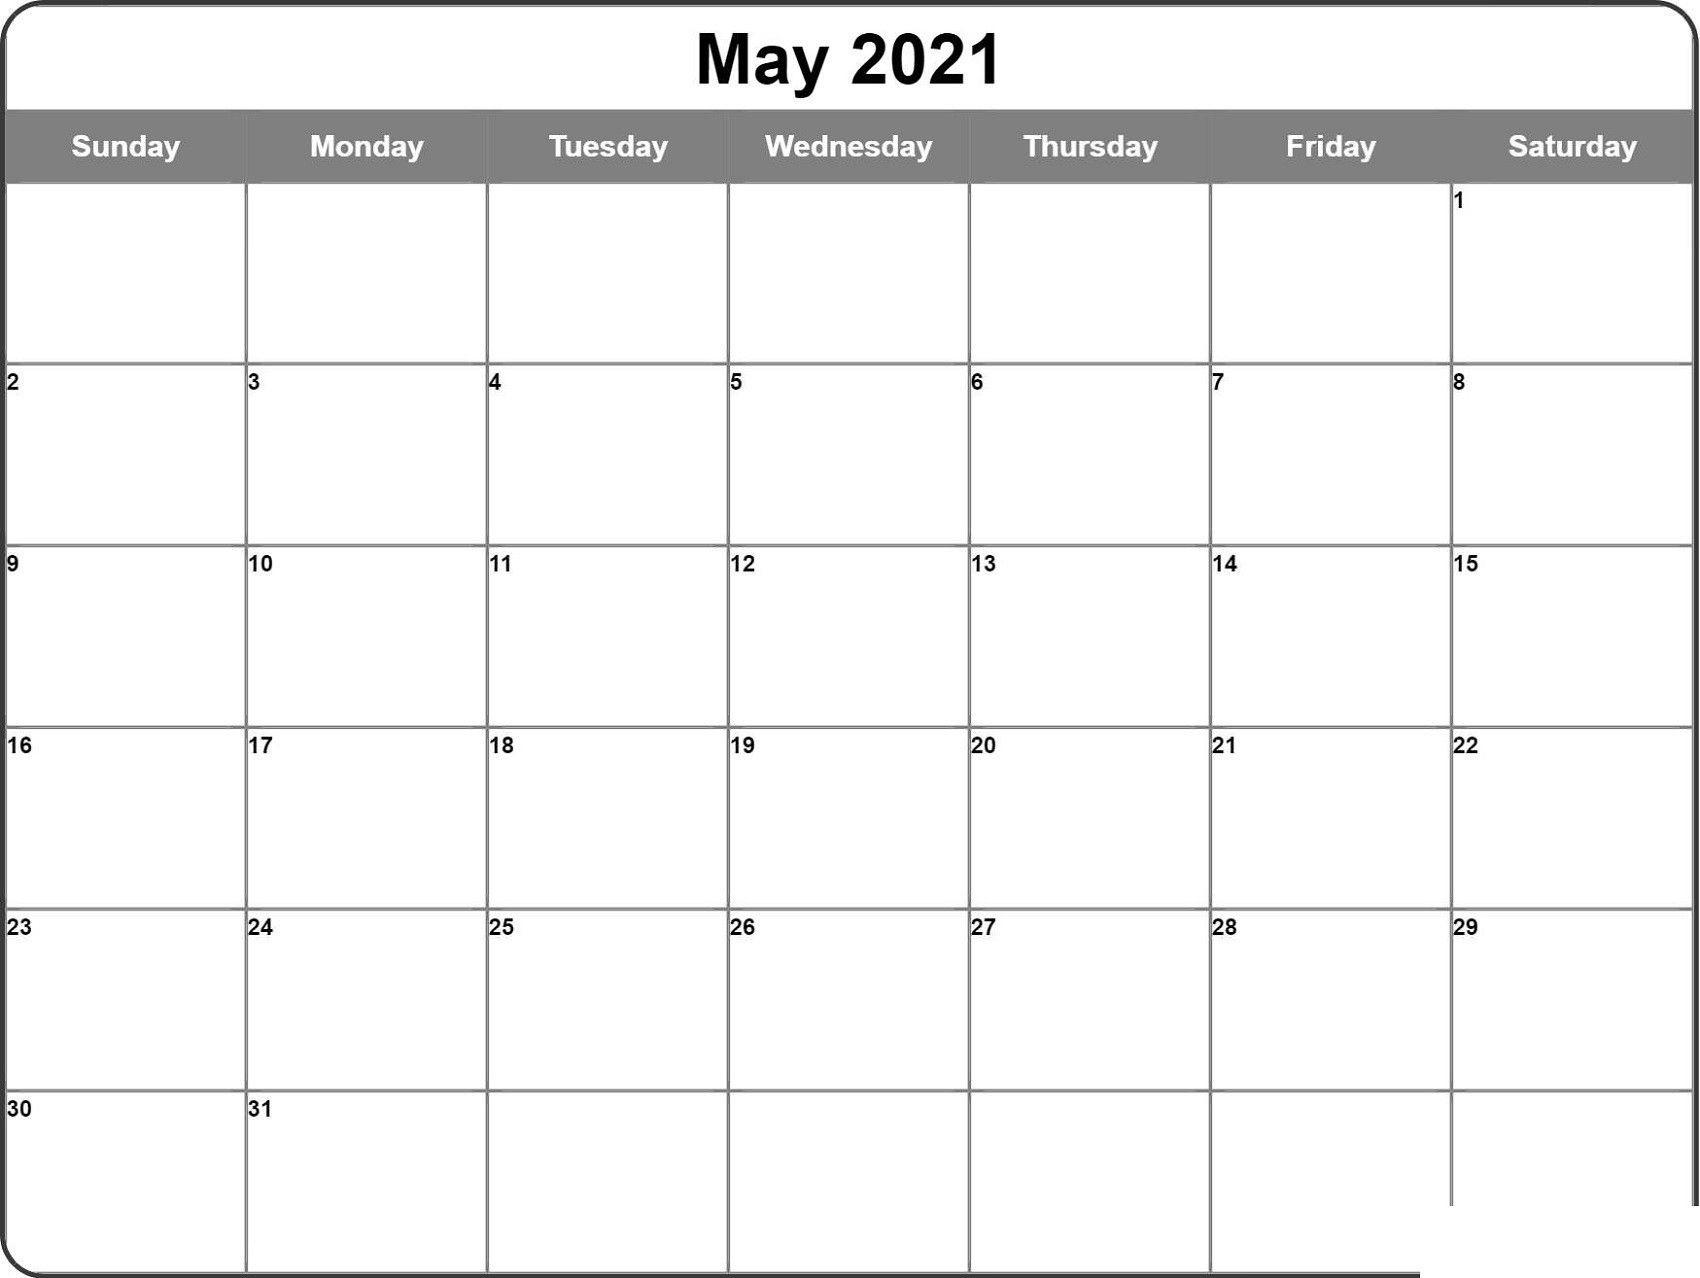 Monthly Calendar 2021 Pdf June for Visitors – Wel e in